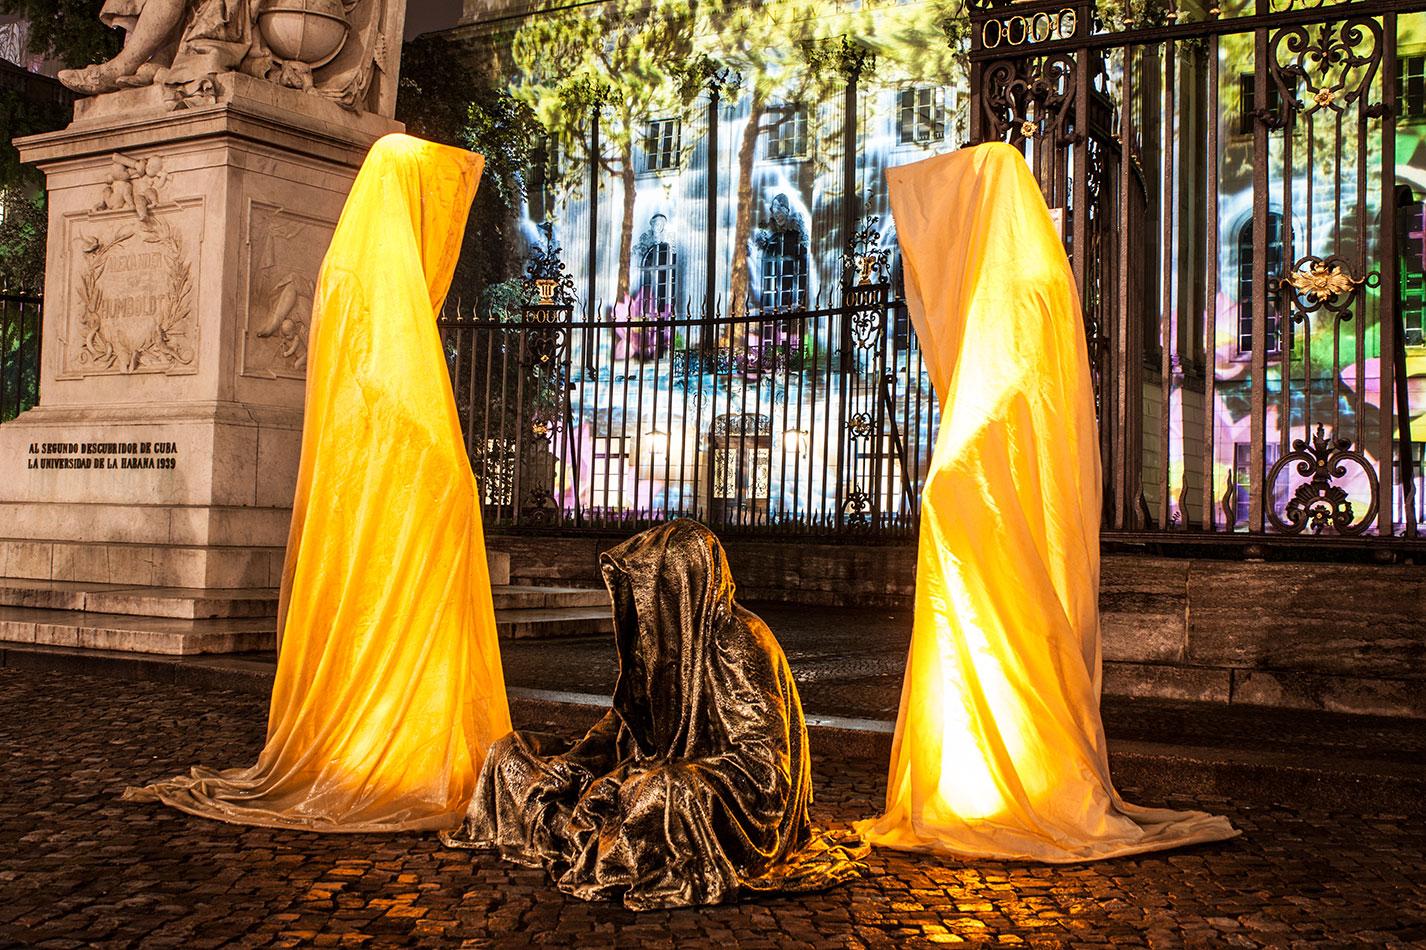 festival-of-lights-berlin-humbold-university-light-art-festival-contemporary-fine-art-design-show-guardiansof-time-manfred-kili-kielnhofer-sculpture-3580